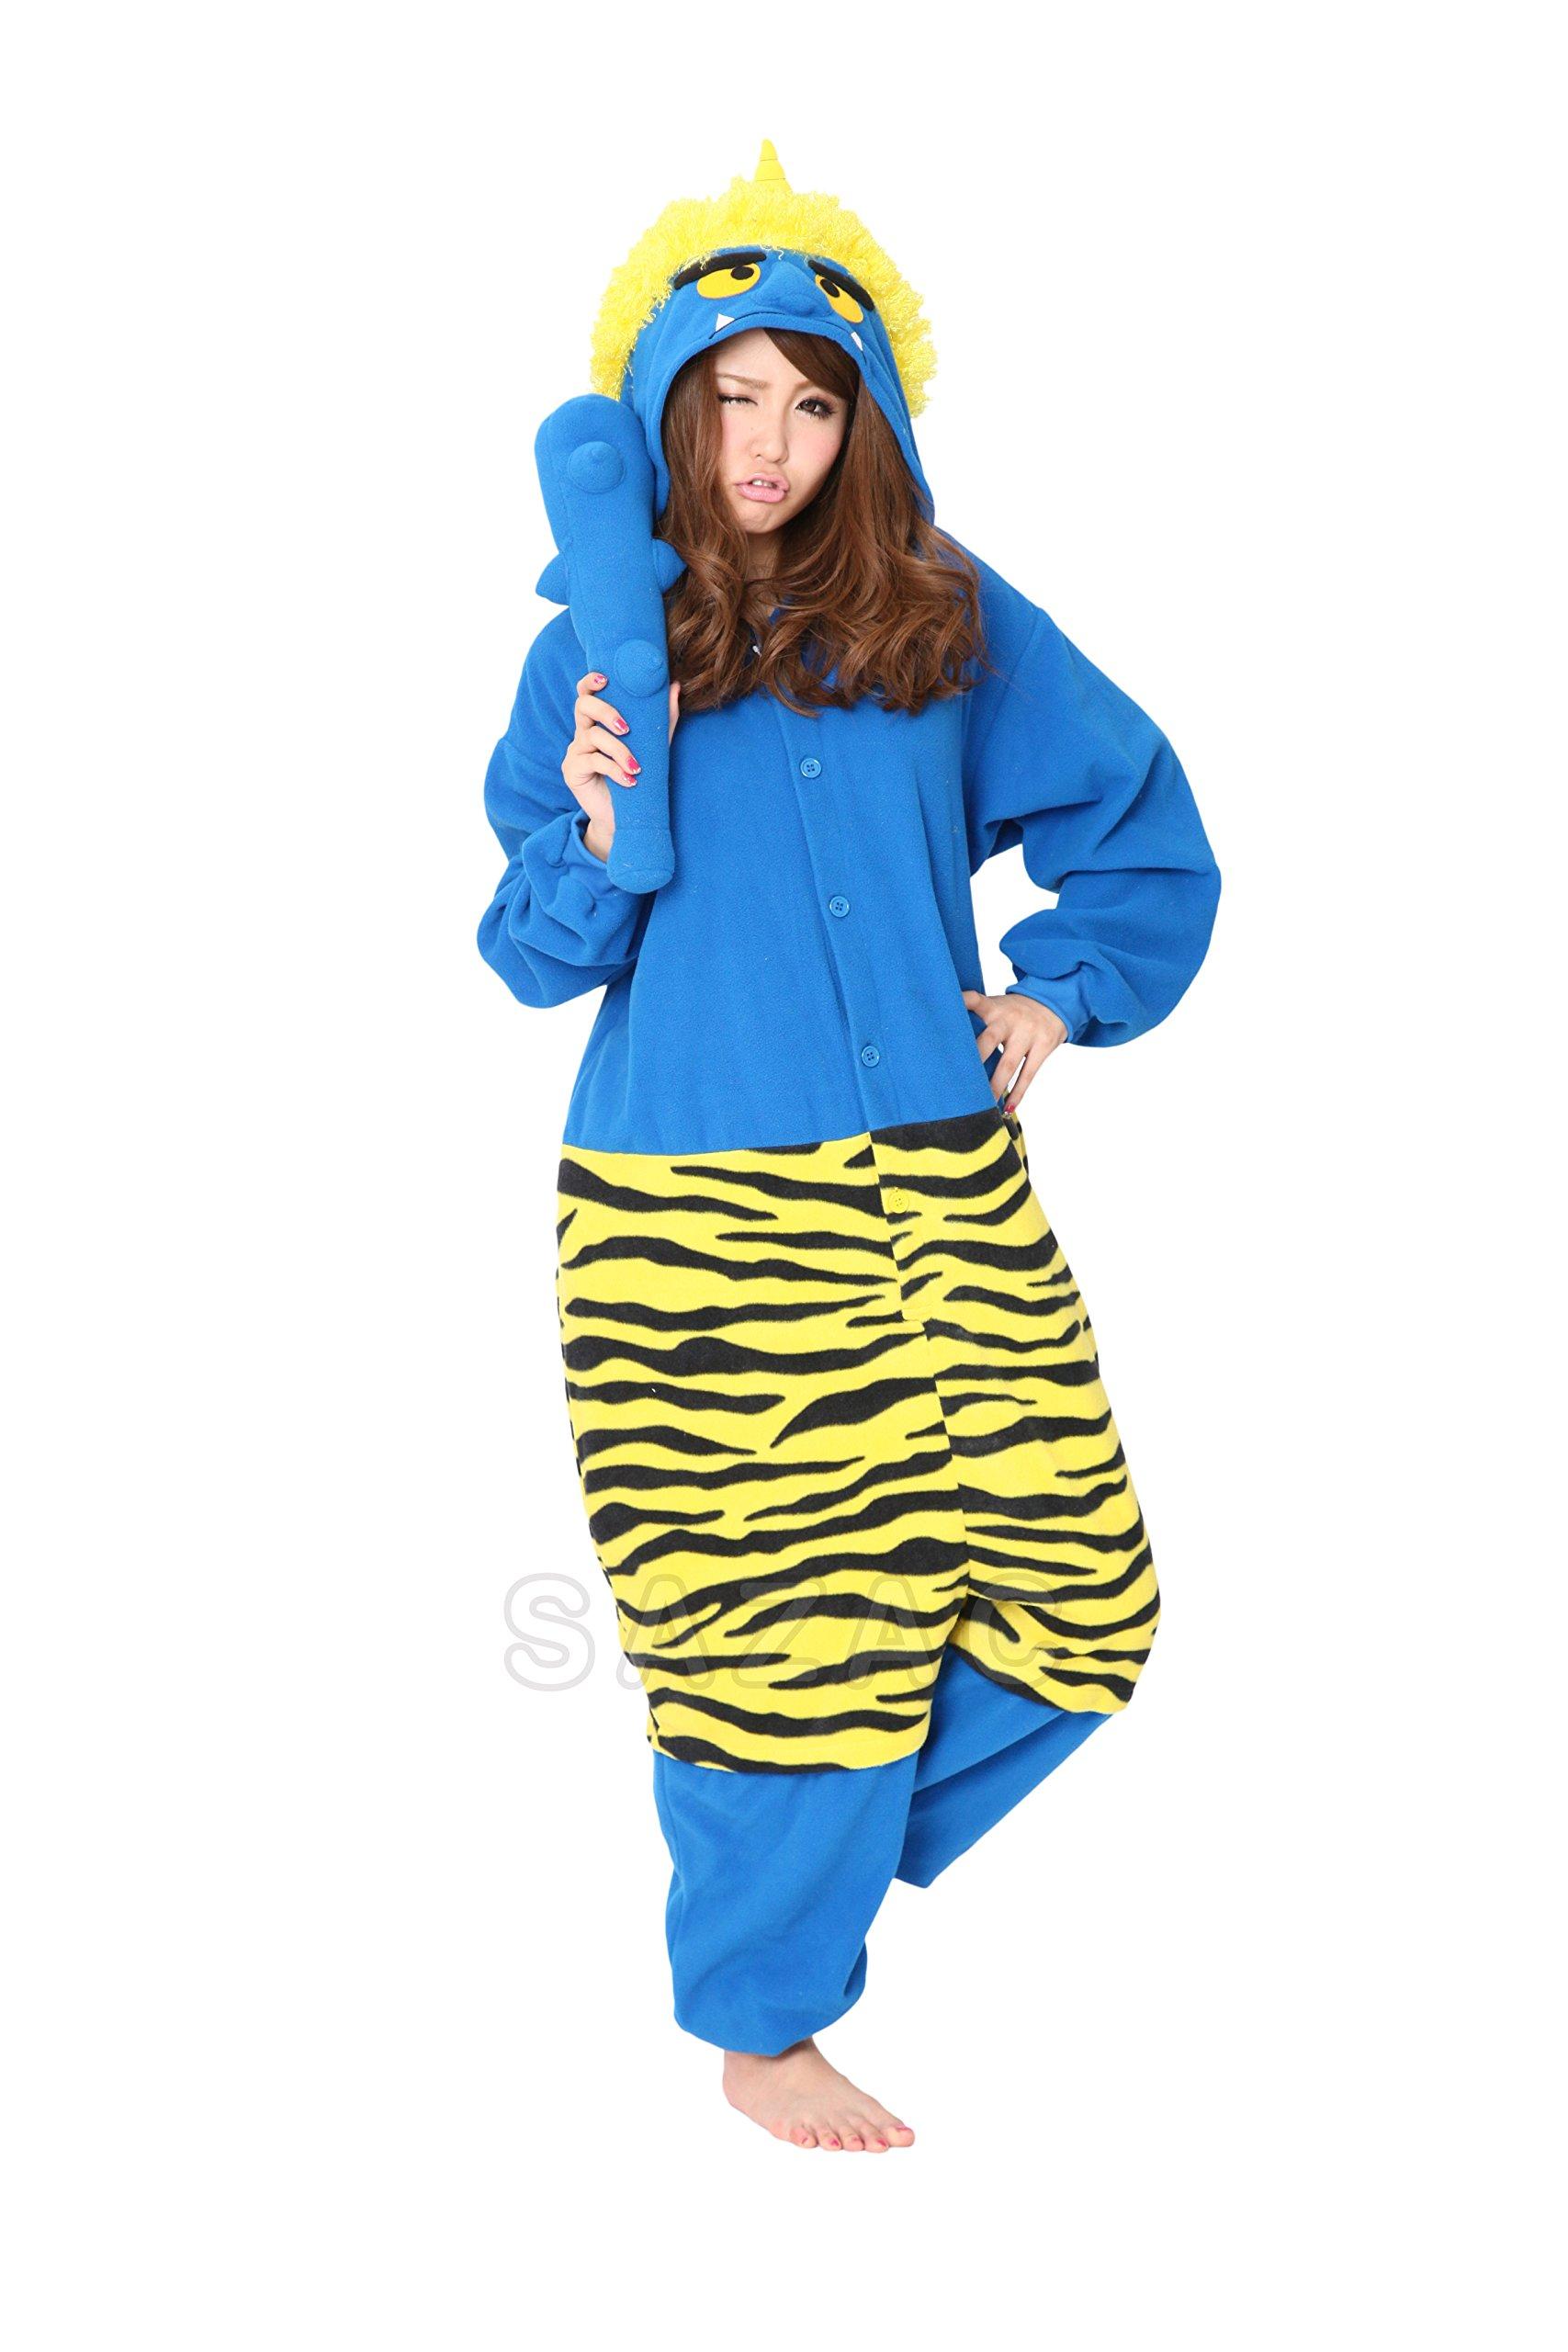 Sazac Sazac Blue Demon Kigurumi - Fancy Dress Costume Pajama